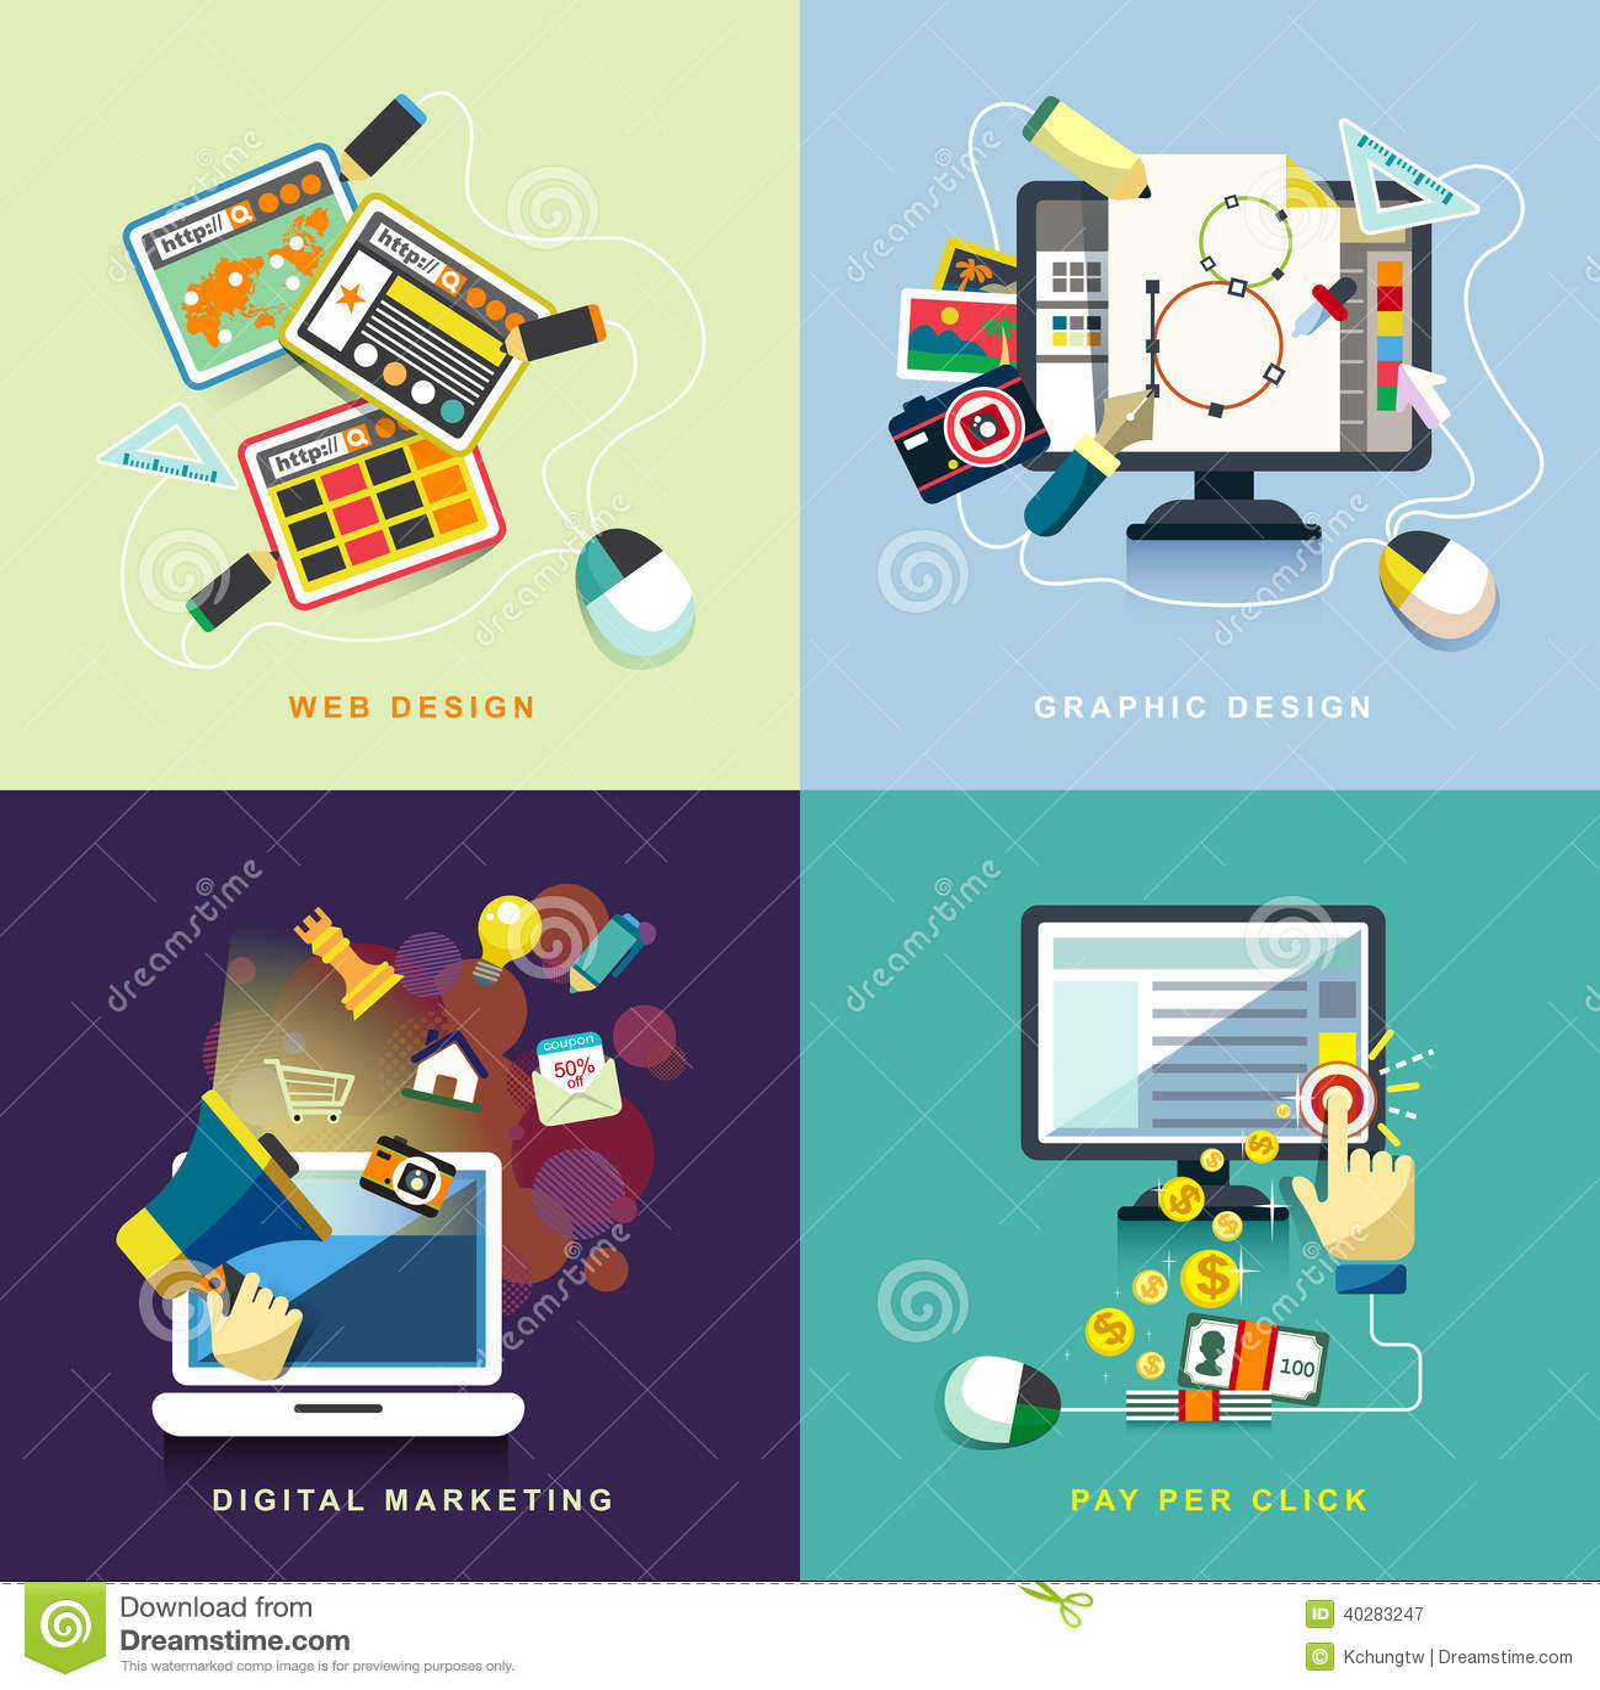 Megamad Website Design Marketing: Flat Web And Graphic Design, Marketing, Pay Per Click